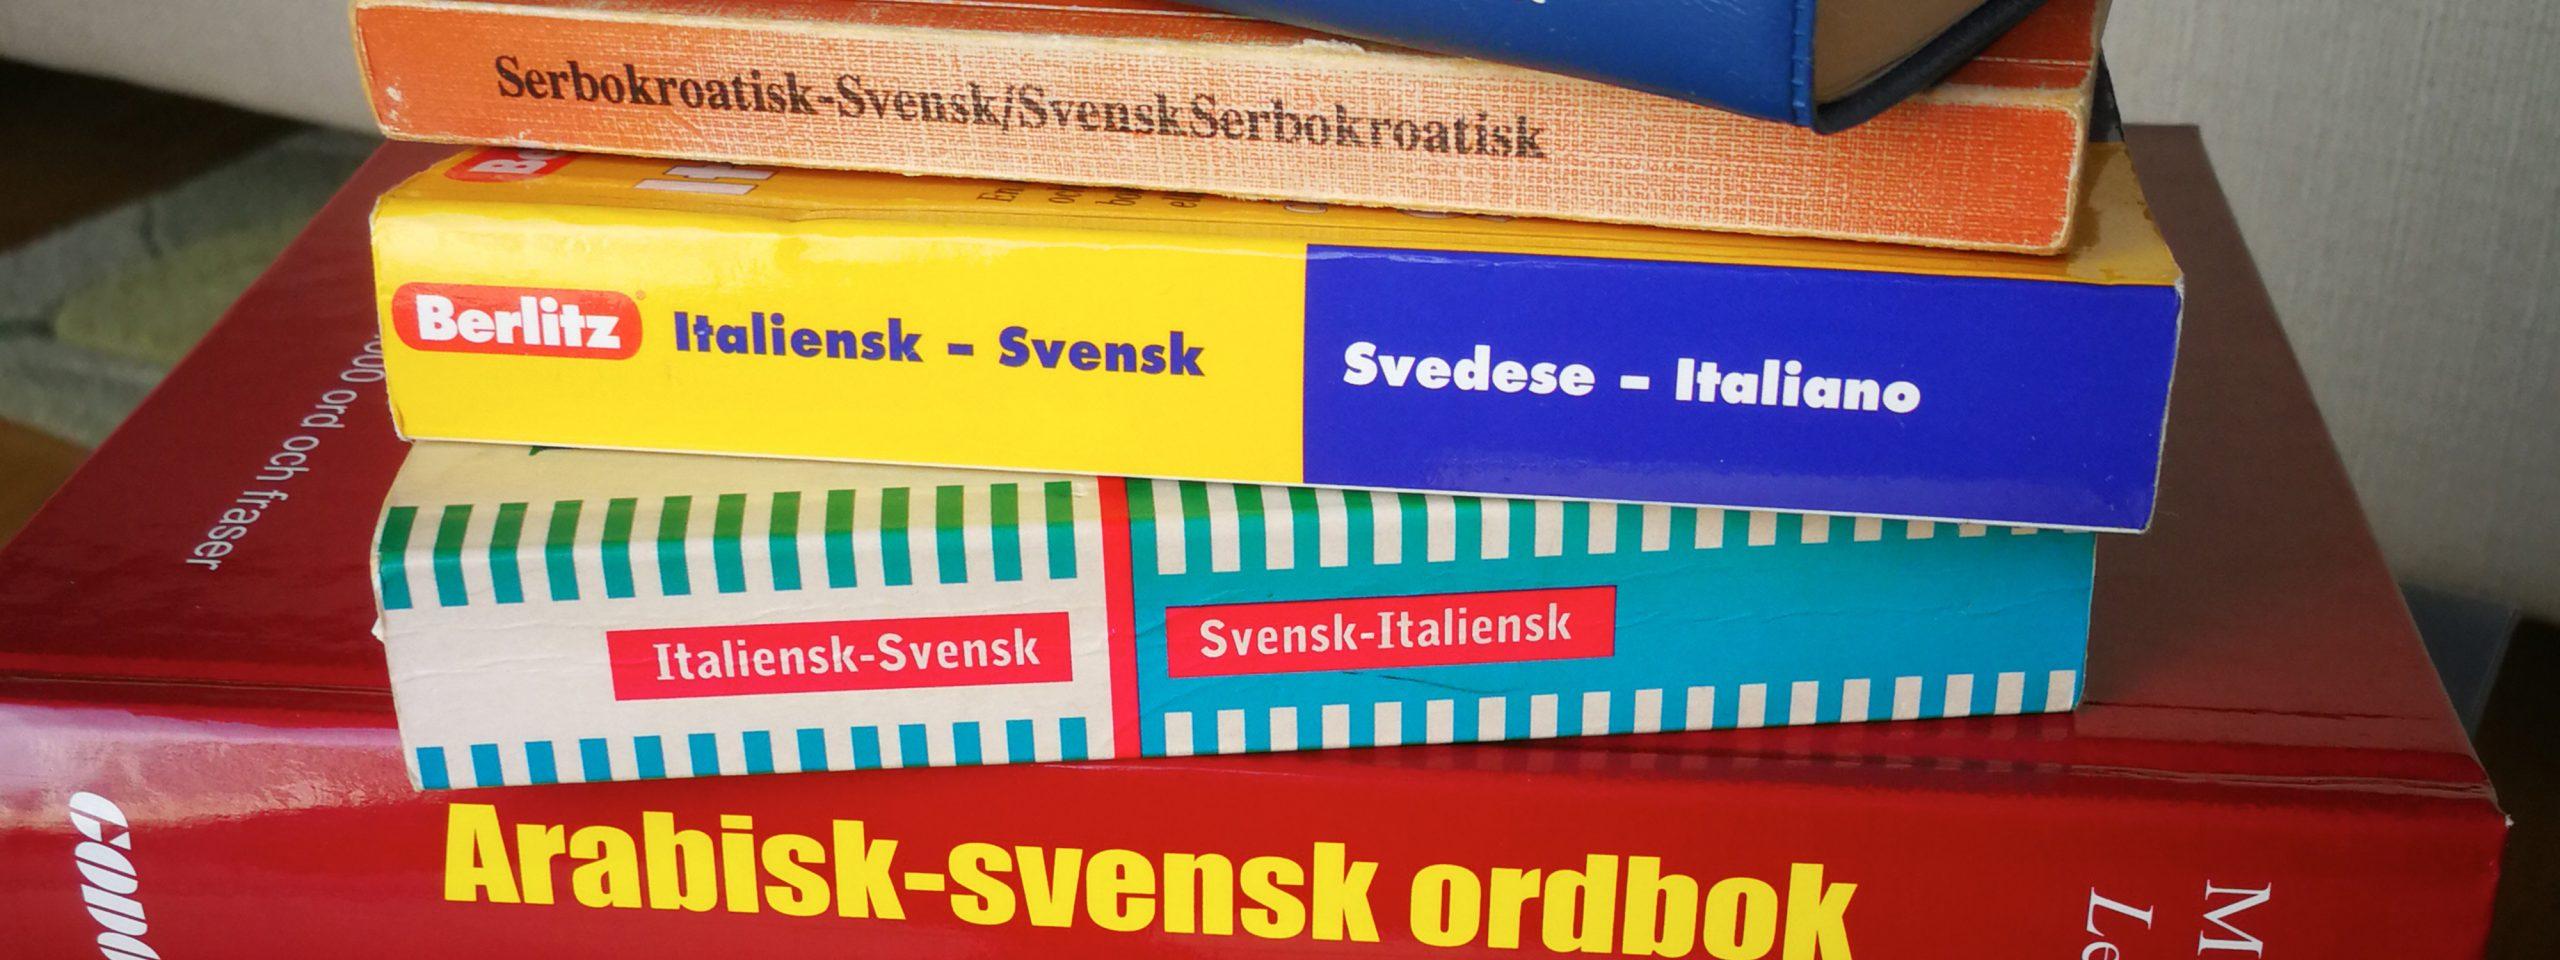 tools to Swedish